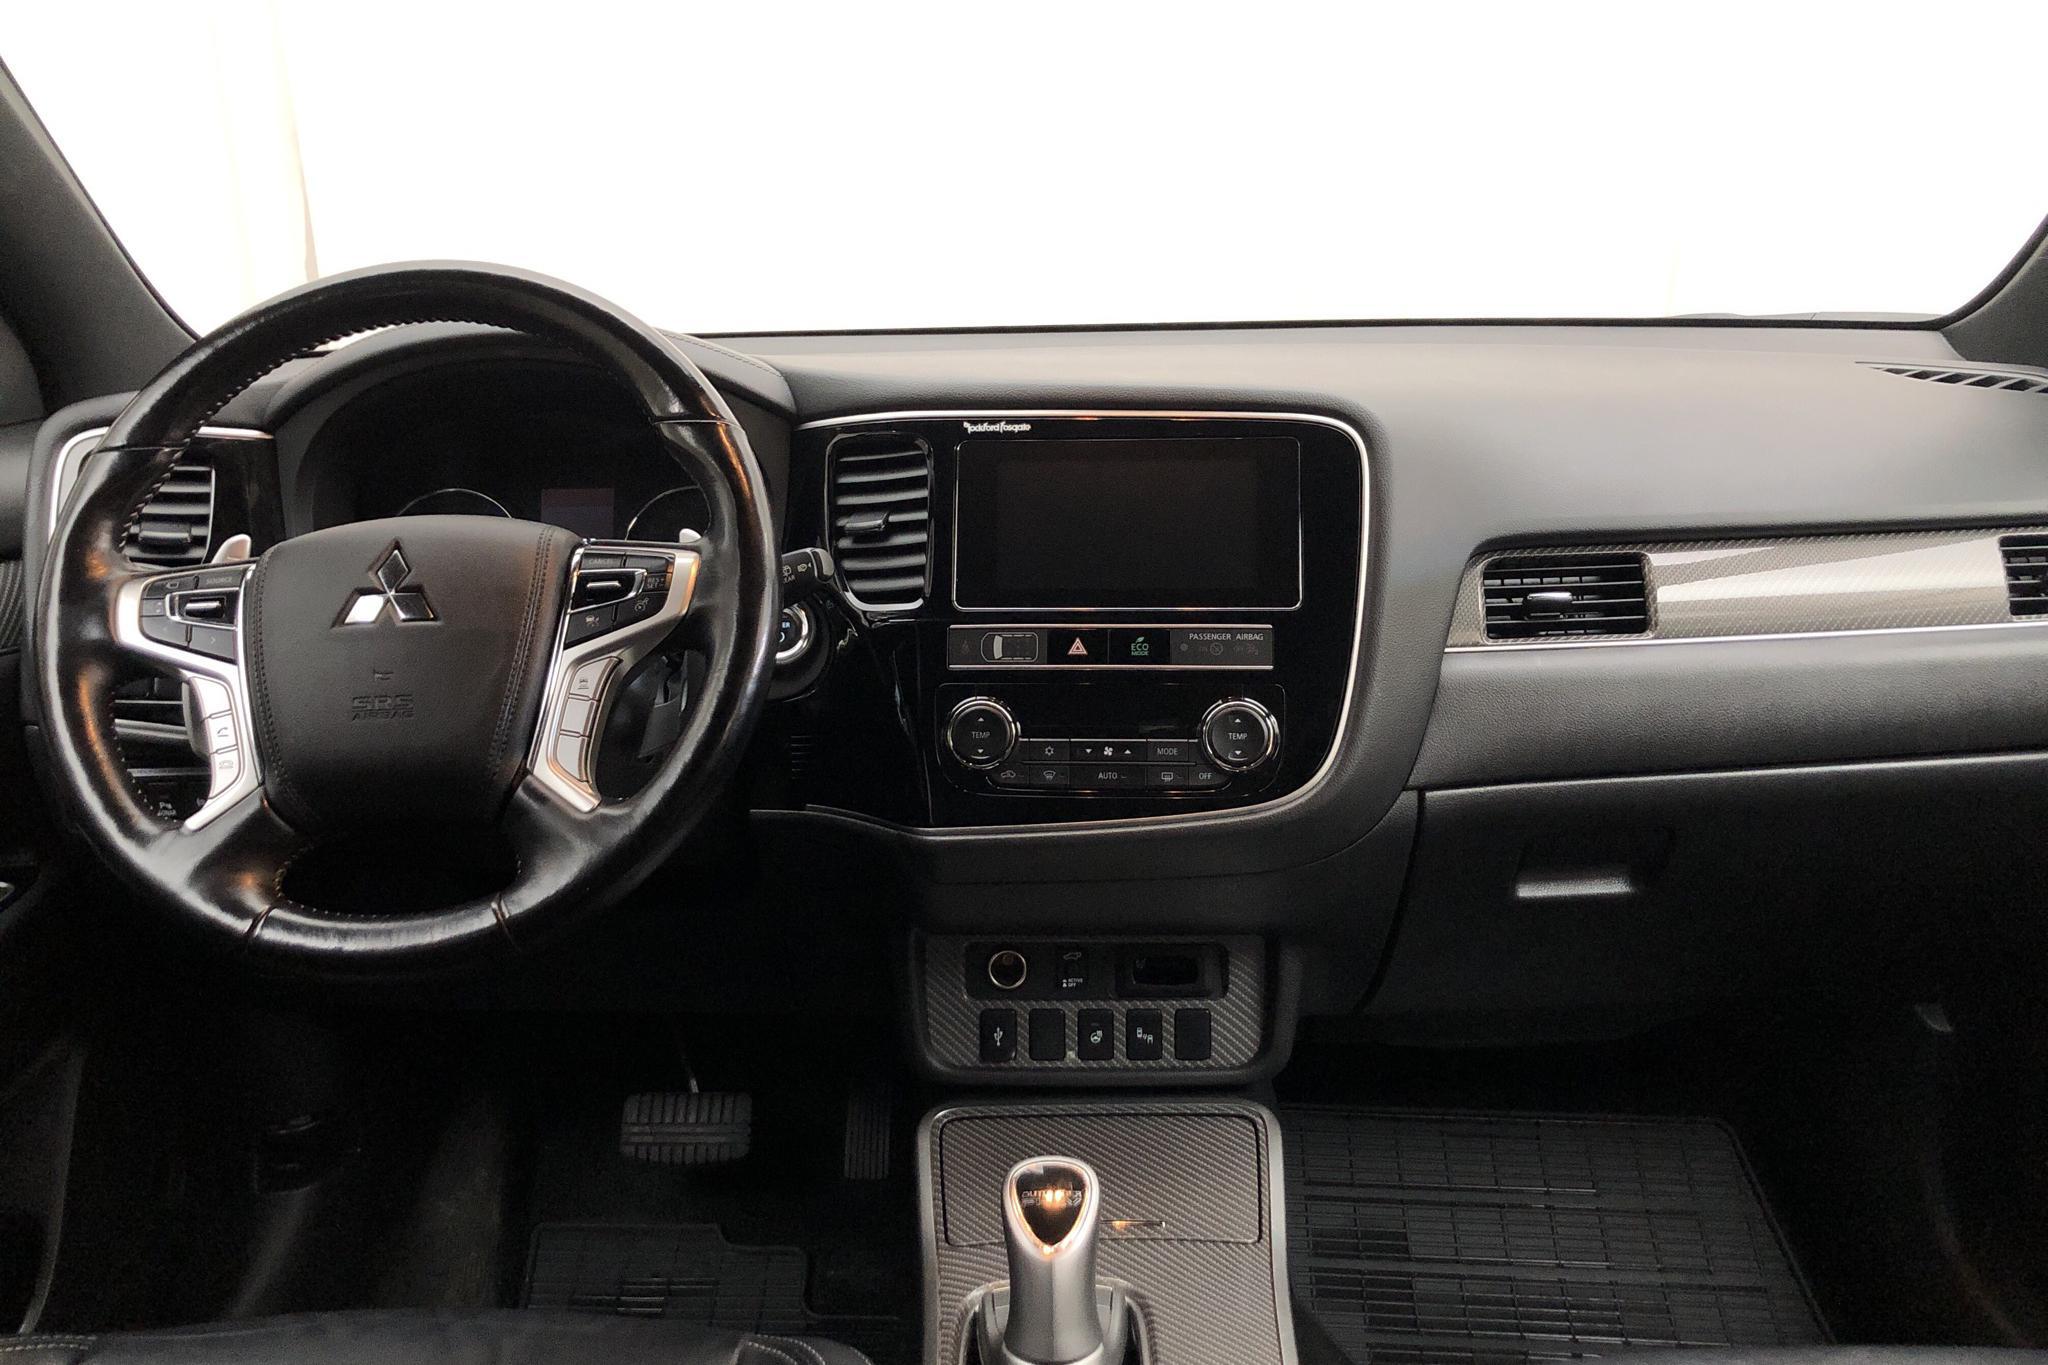 Mitsubishi Outlander 2.4 Plug-in Hybrid 4WD (136hk) - 93 060 km - Automatic - white - 2019